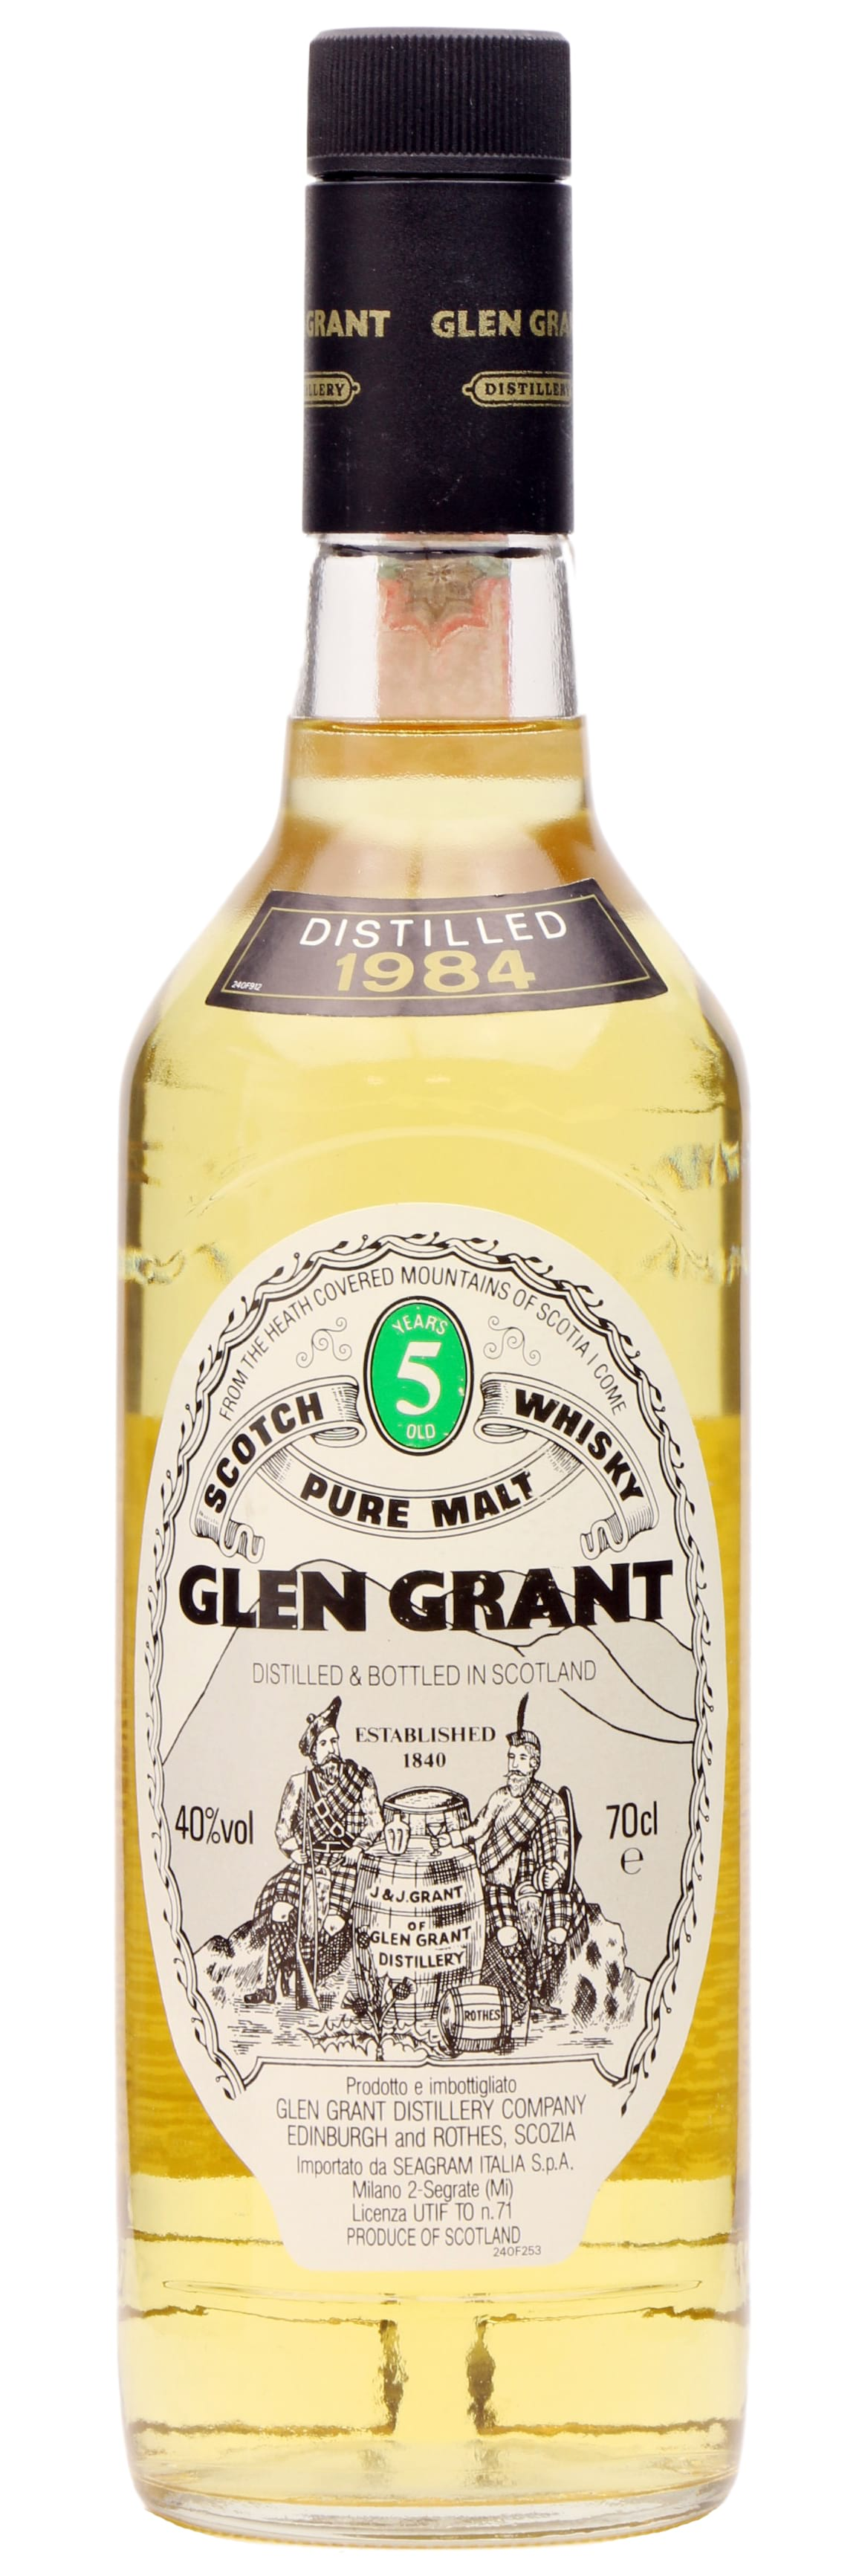 1984 Glen Grant Pure Malt 5 Years Old фото